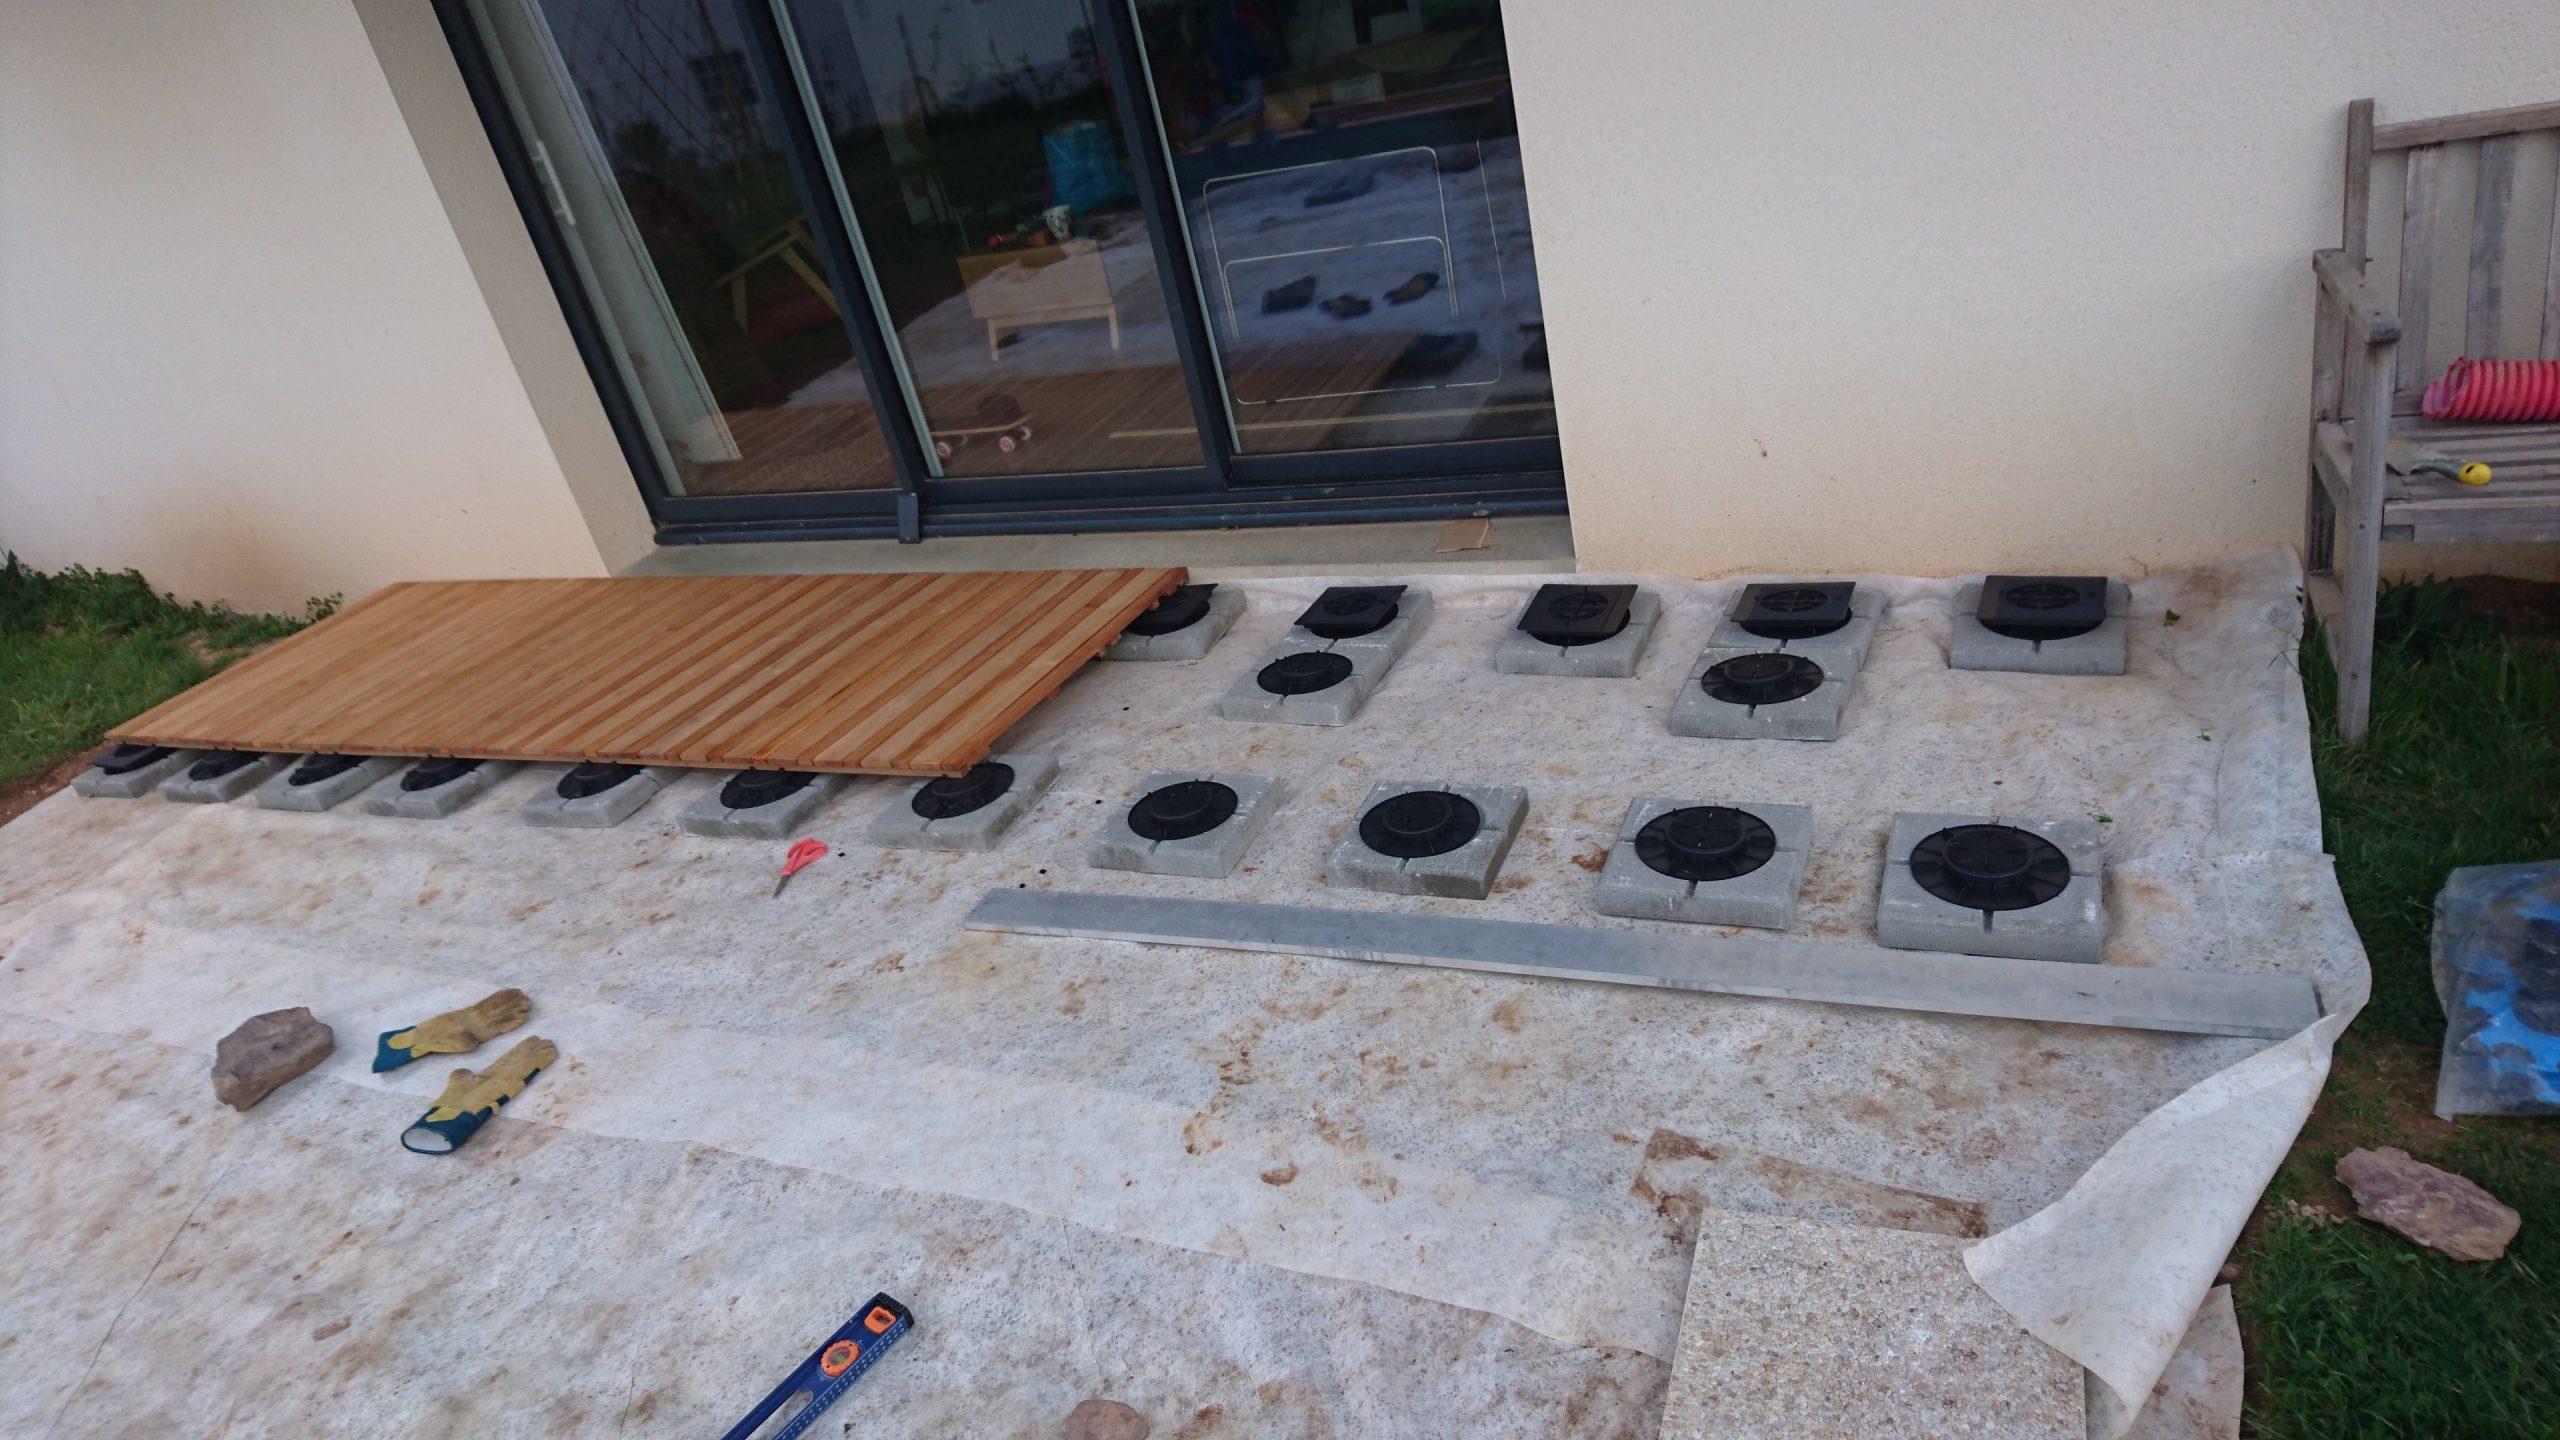 Construire Sa Terrasse Sur De La Terre Meuble - Construction ... concernant Plot De Terre